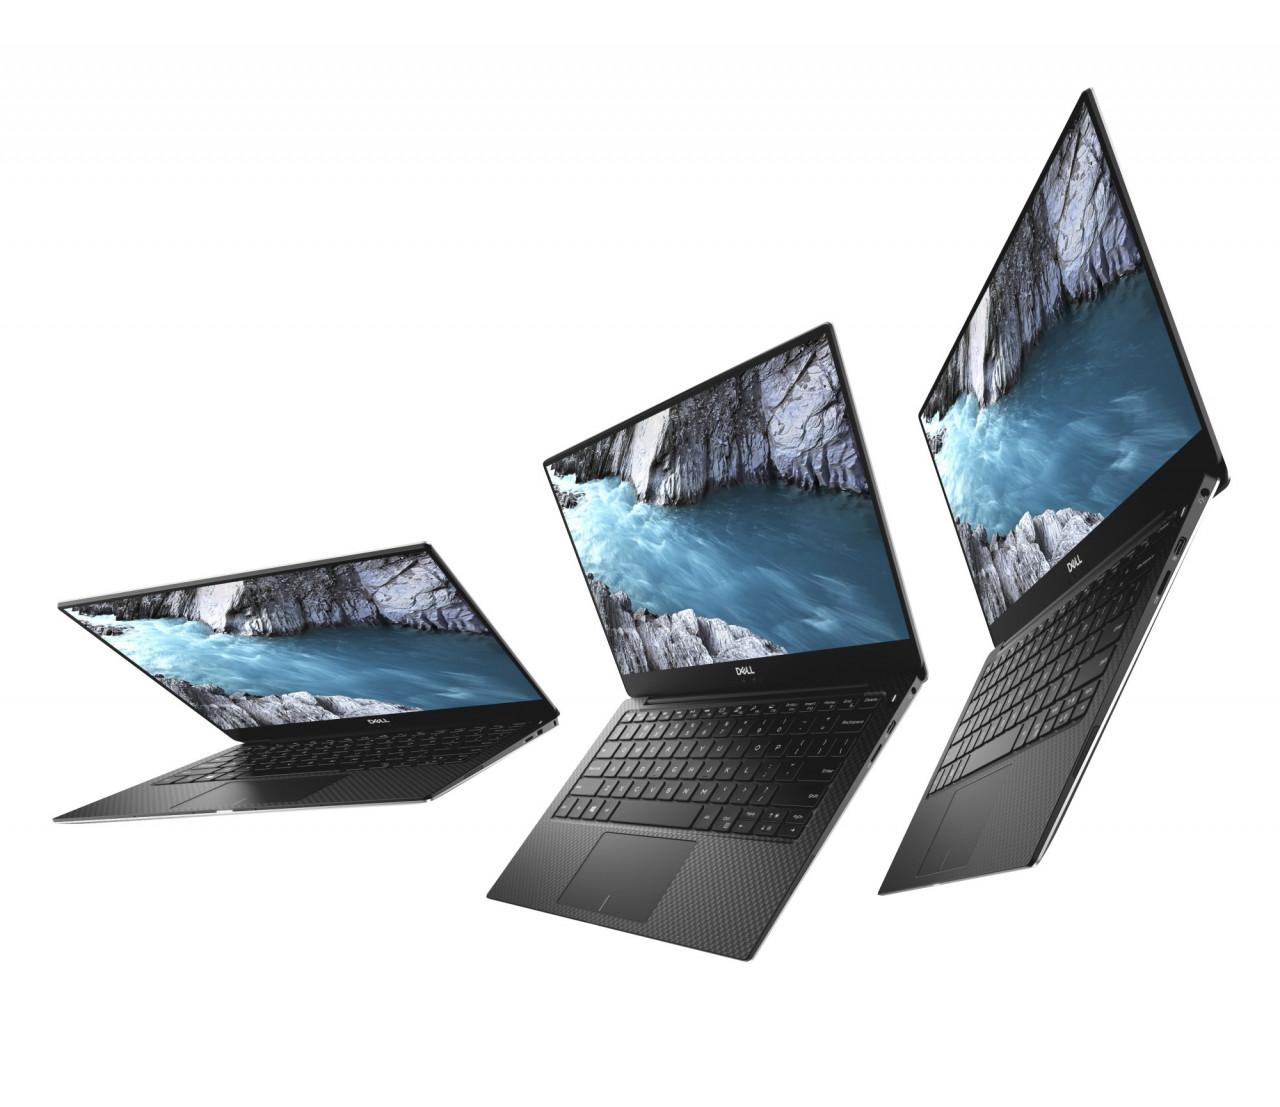 Dell XPS 13 9370 Intel Core i7 8550U 16GB RAM 512GB NVMe M 2 SSD INTEL UHD  Graphics 620 13 0